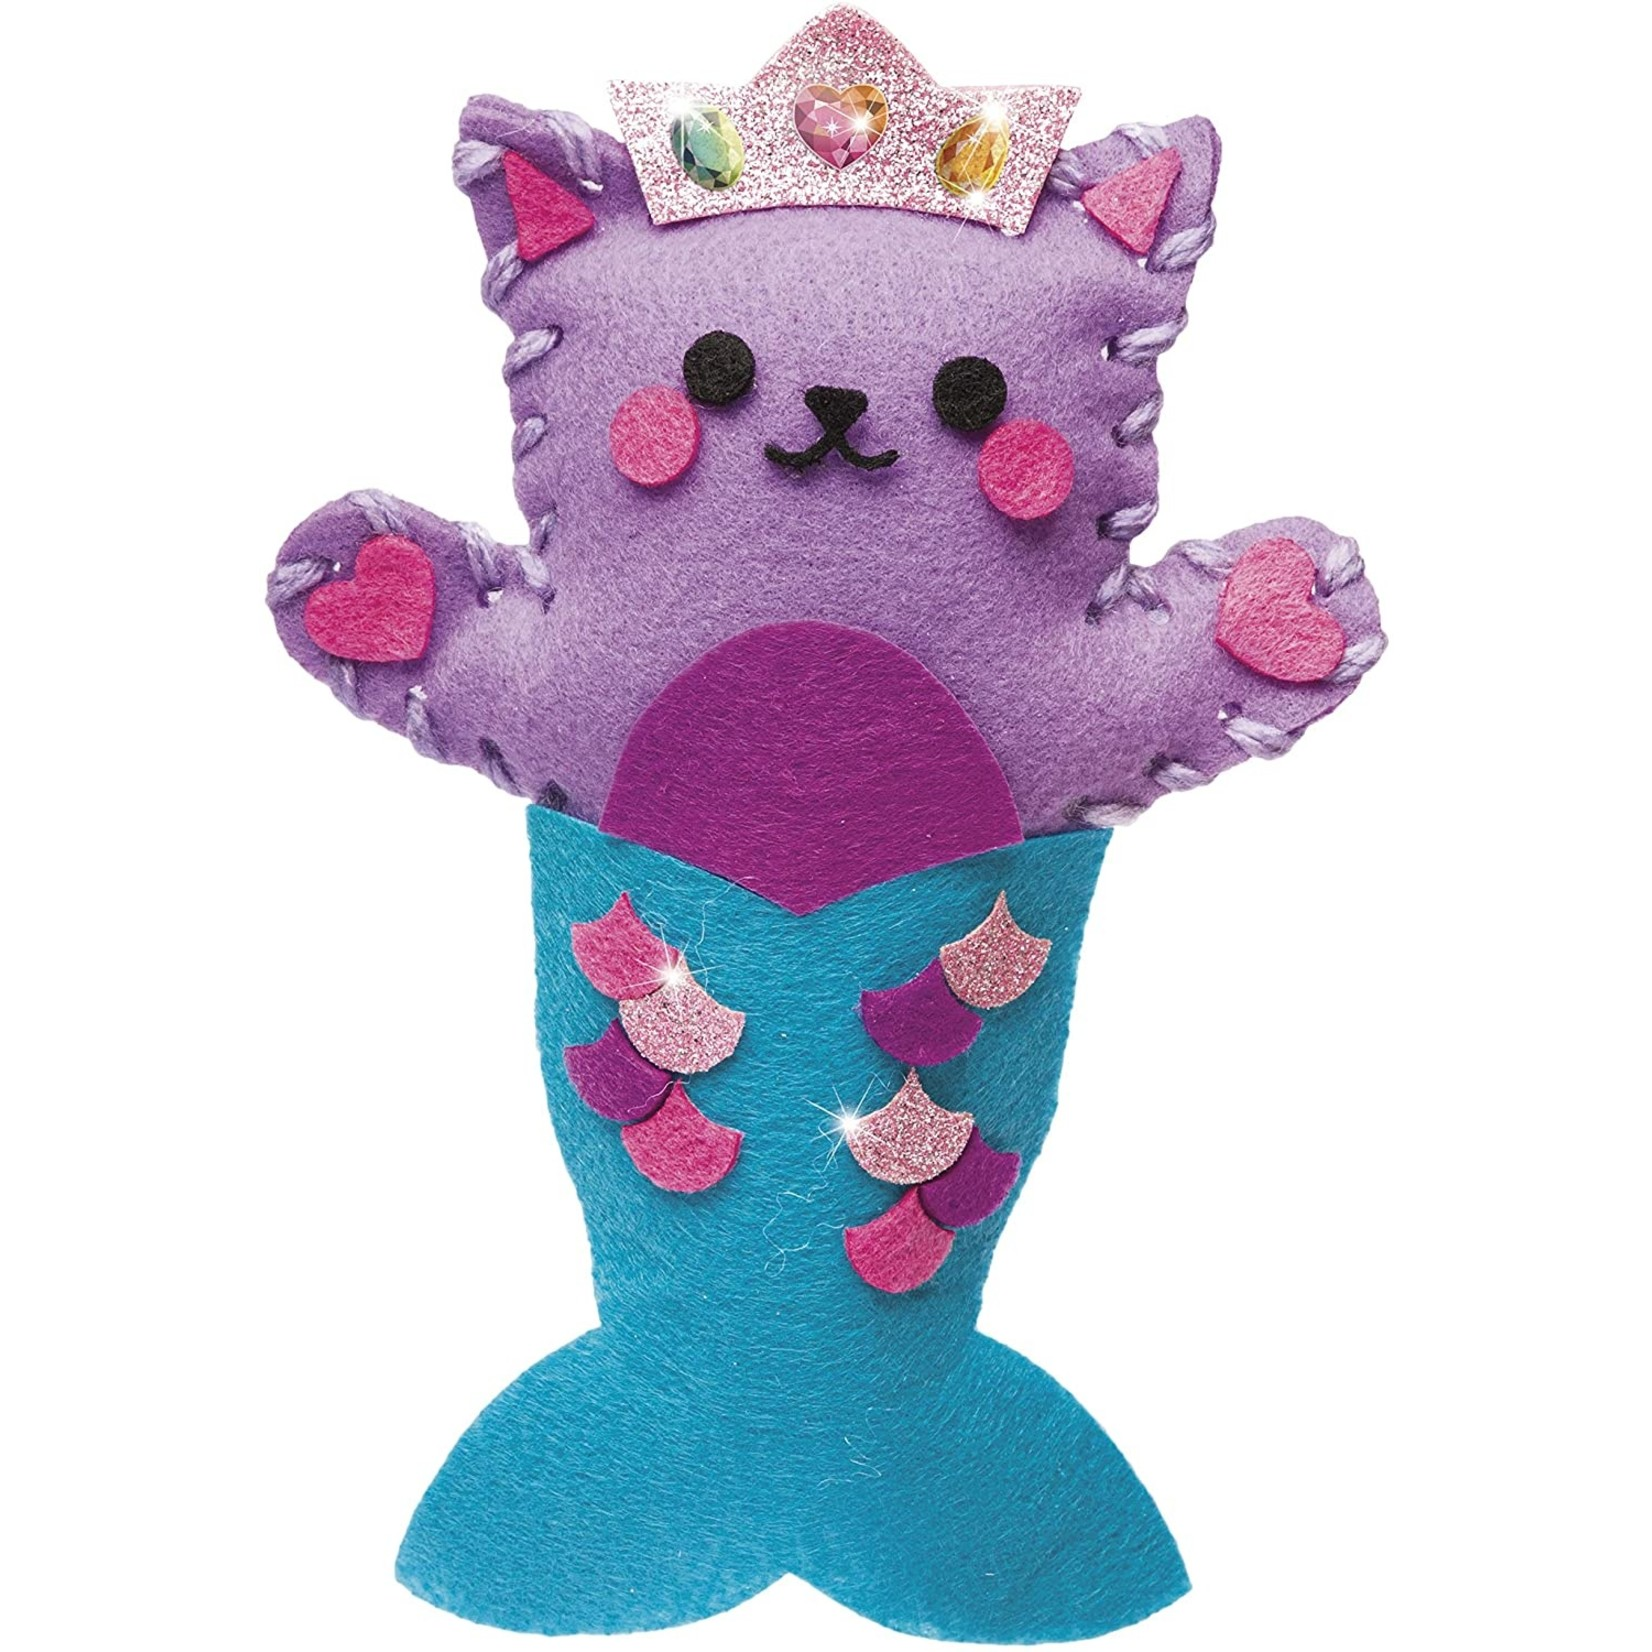 Klutz My Cat & Mermaid & Friends